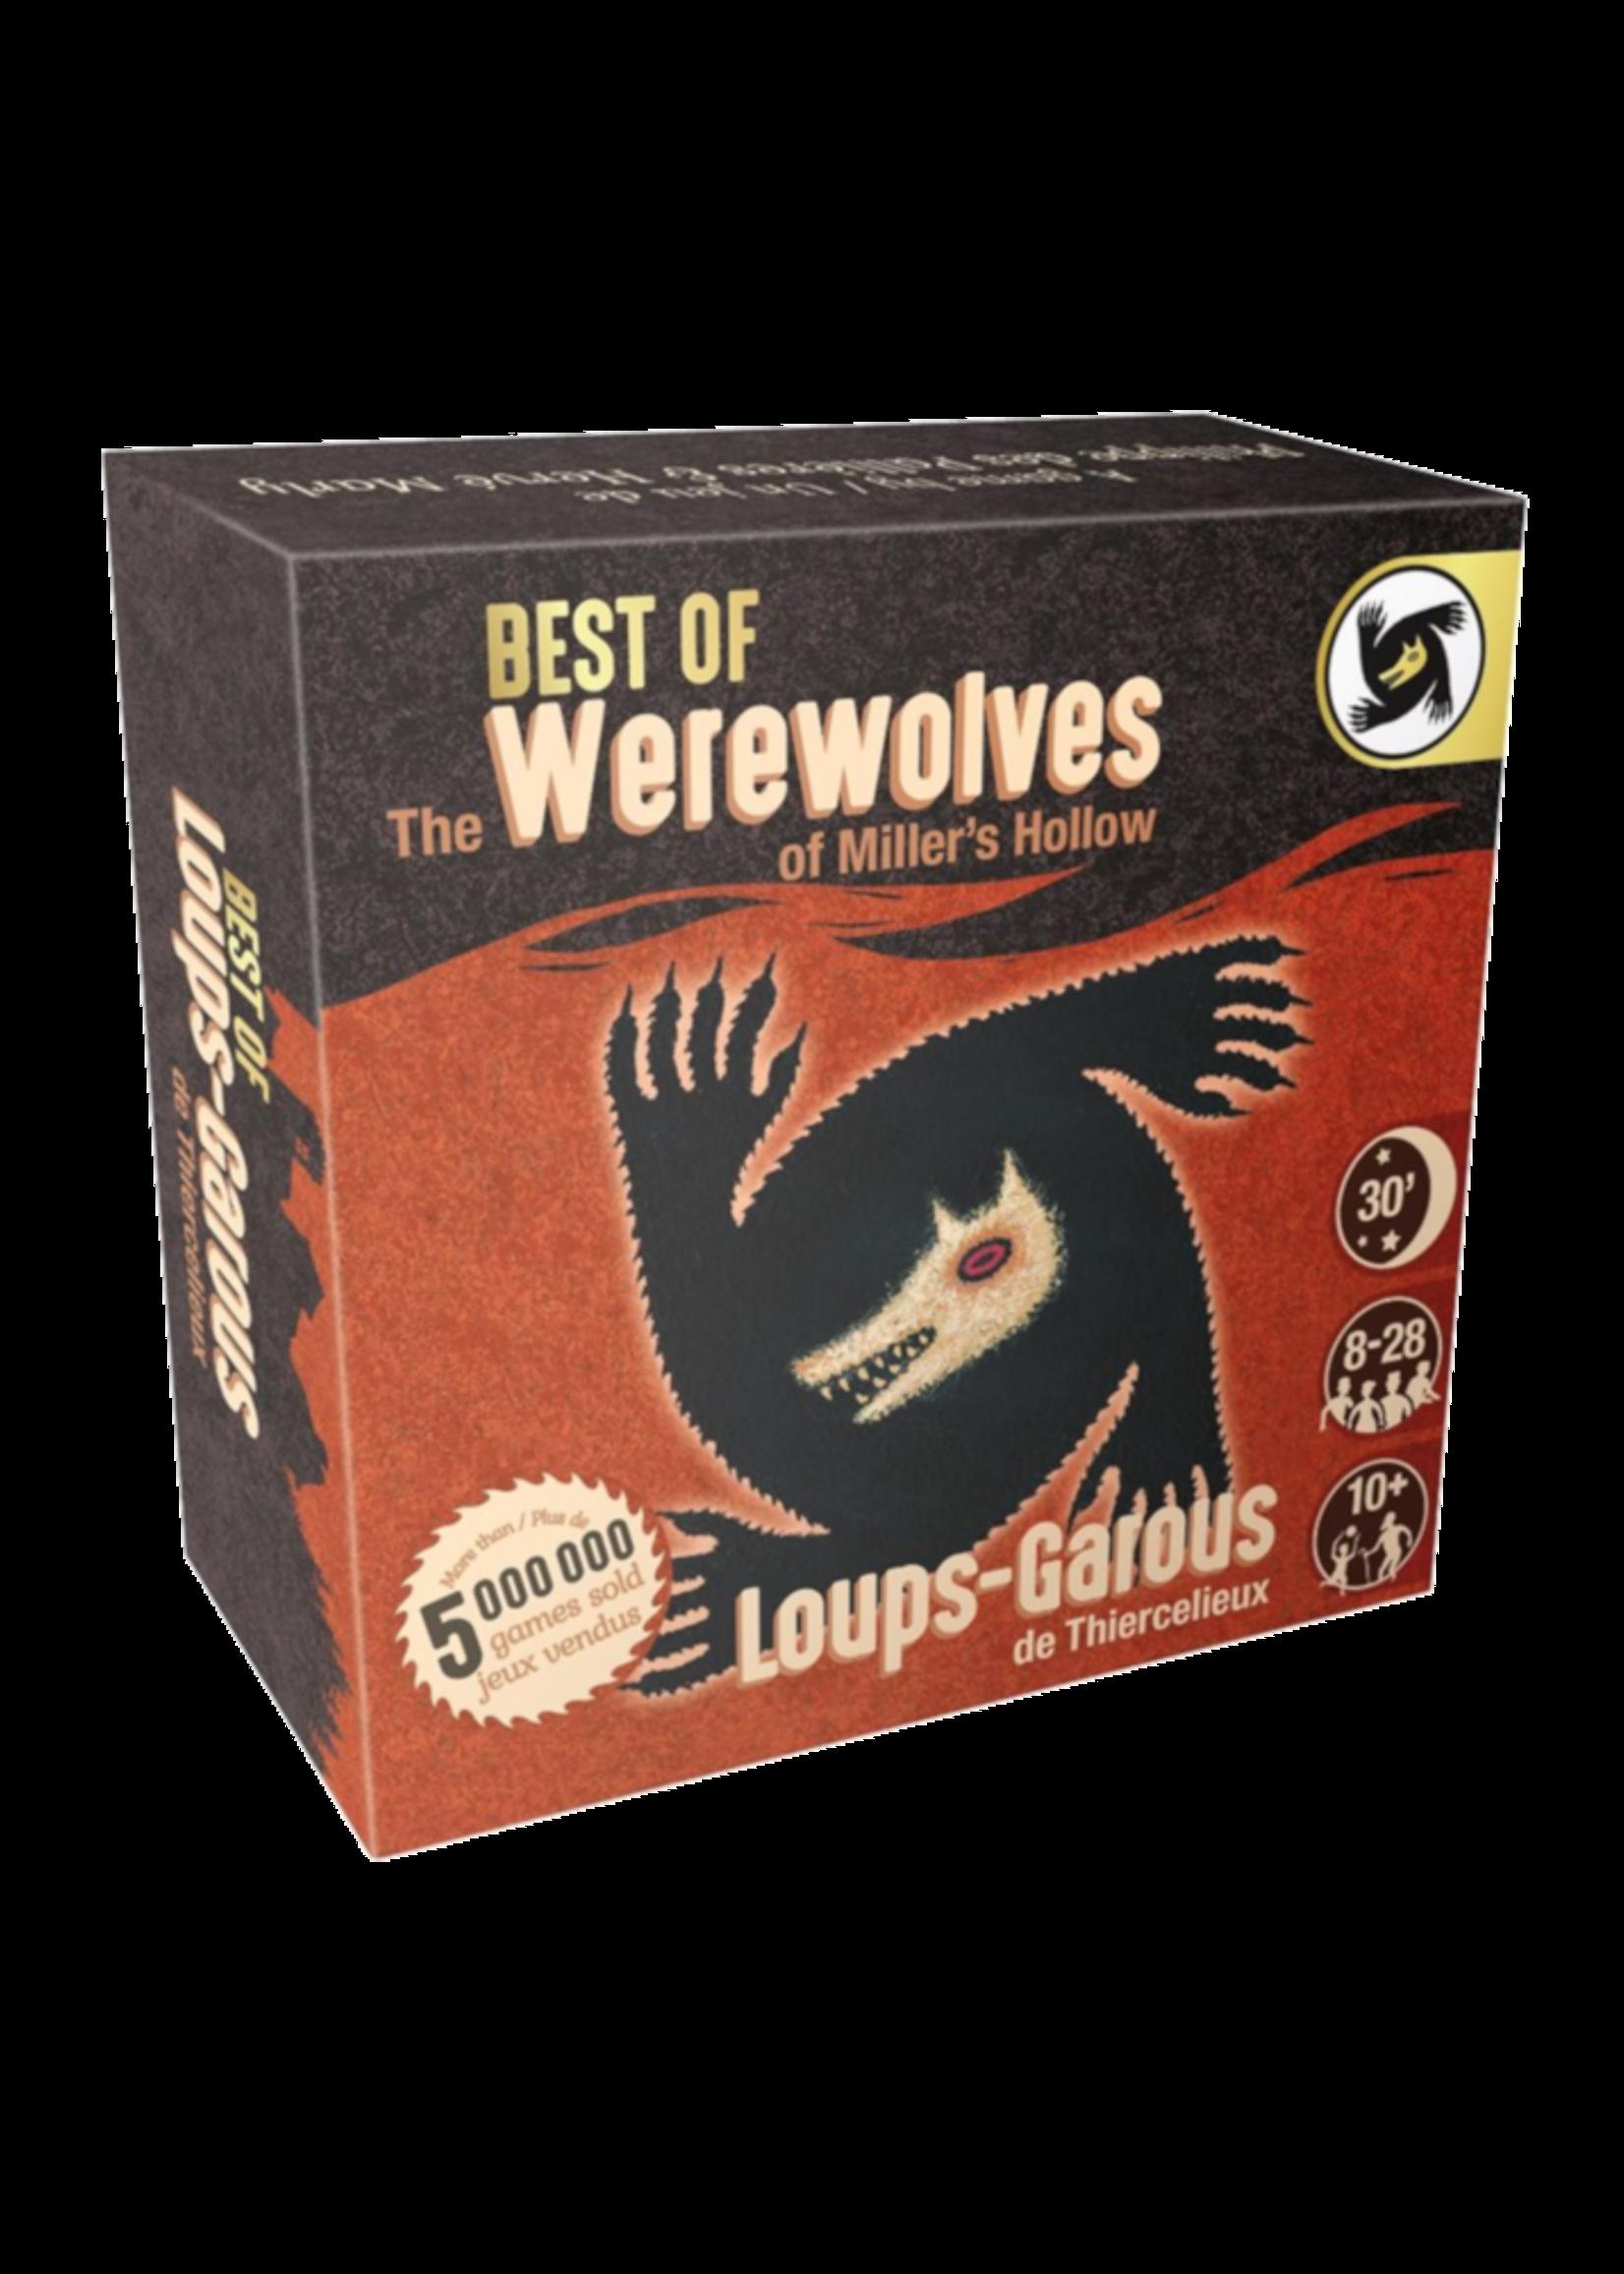 Werewolves Best of - The Werewolves of Miller's Hollow